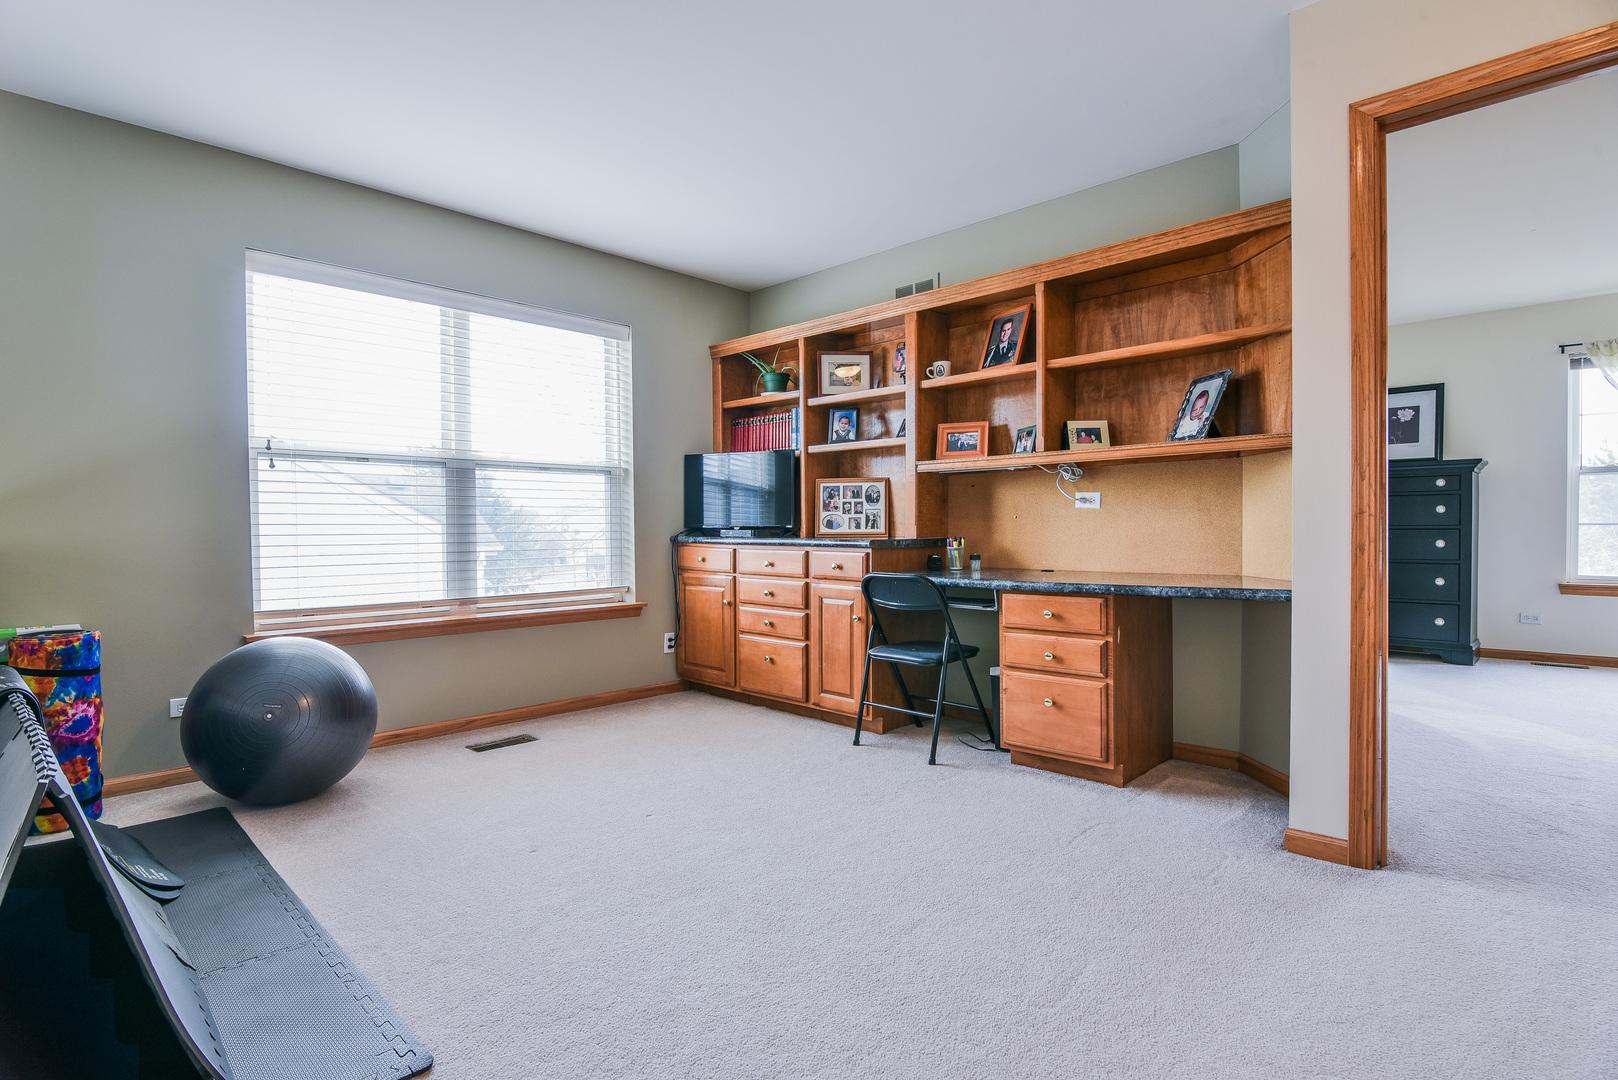 802 Honeysuckle, AURORA, Illinois, 60506